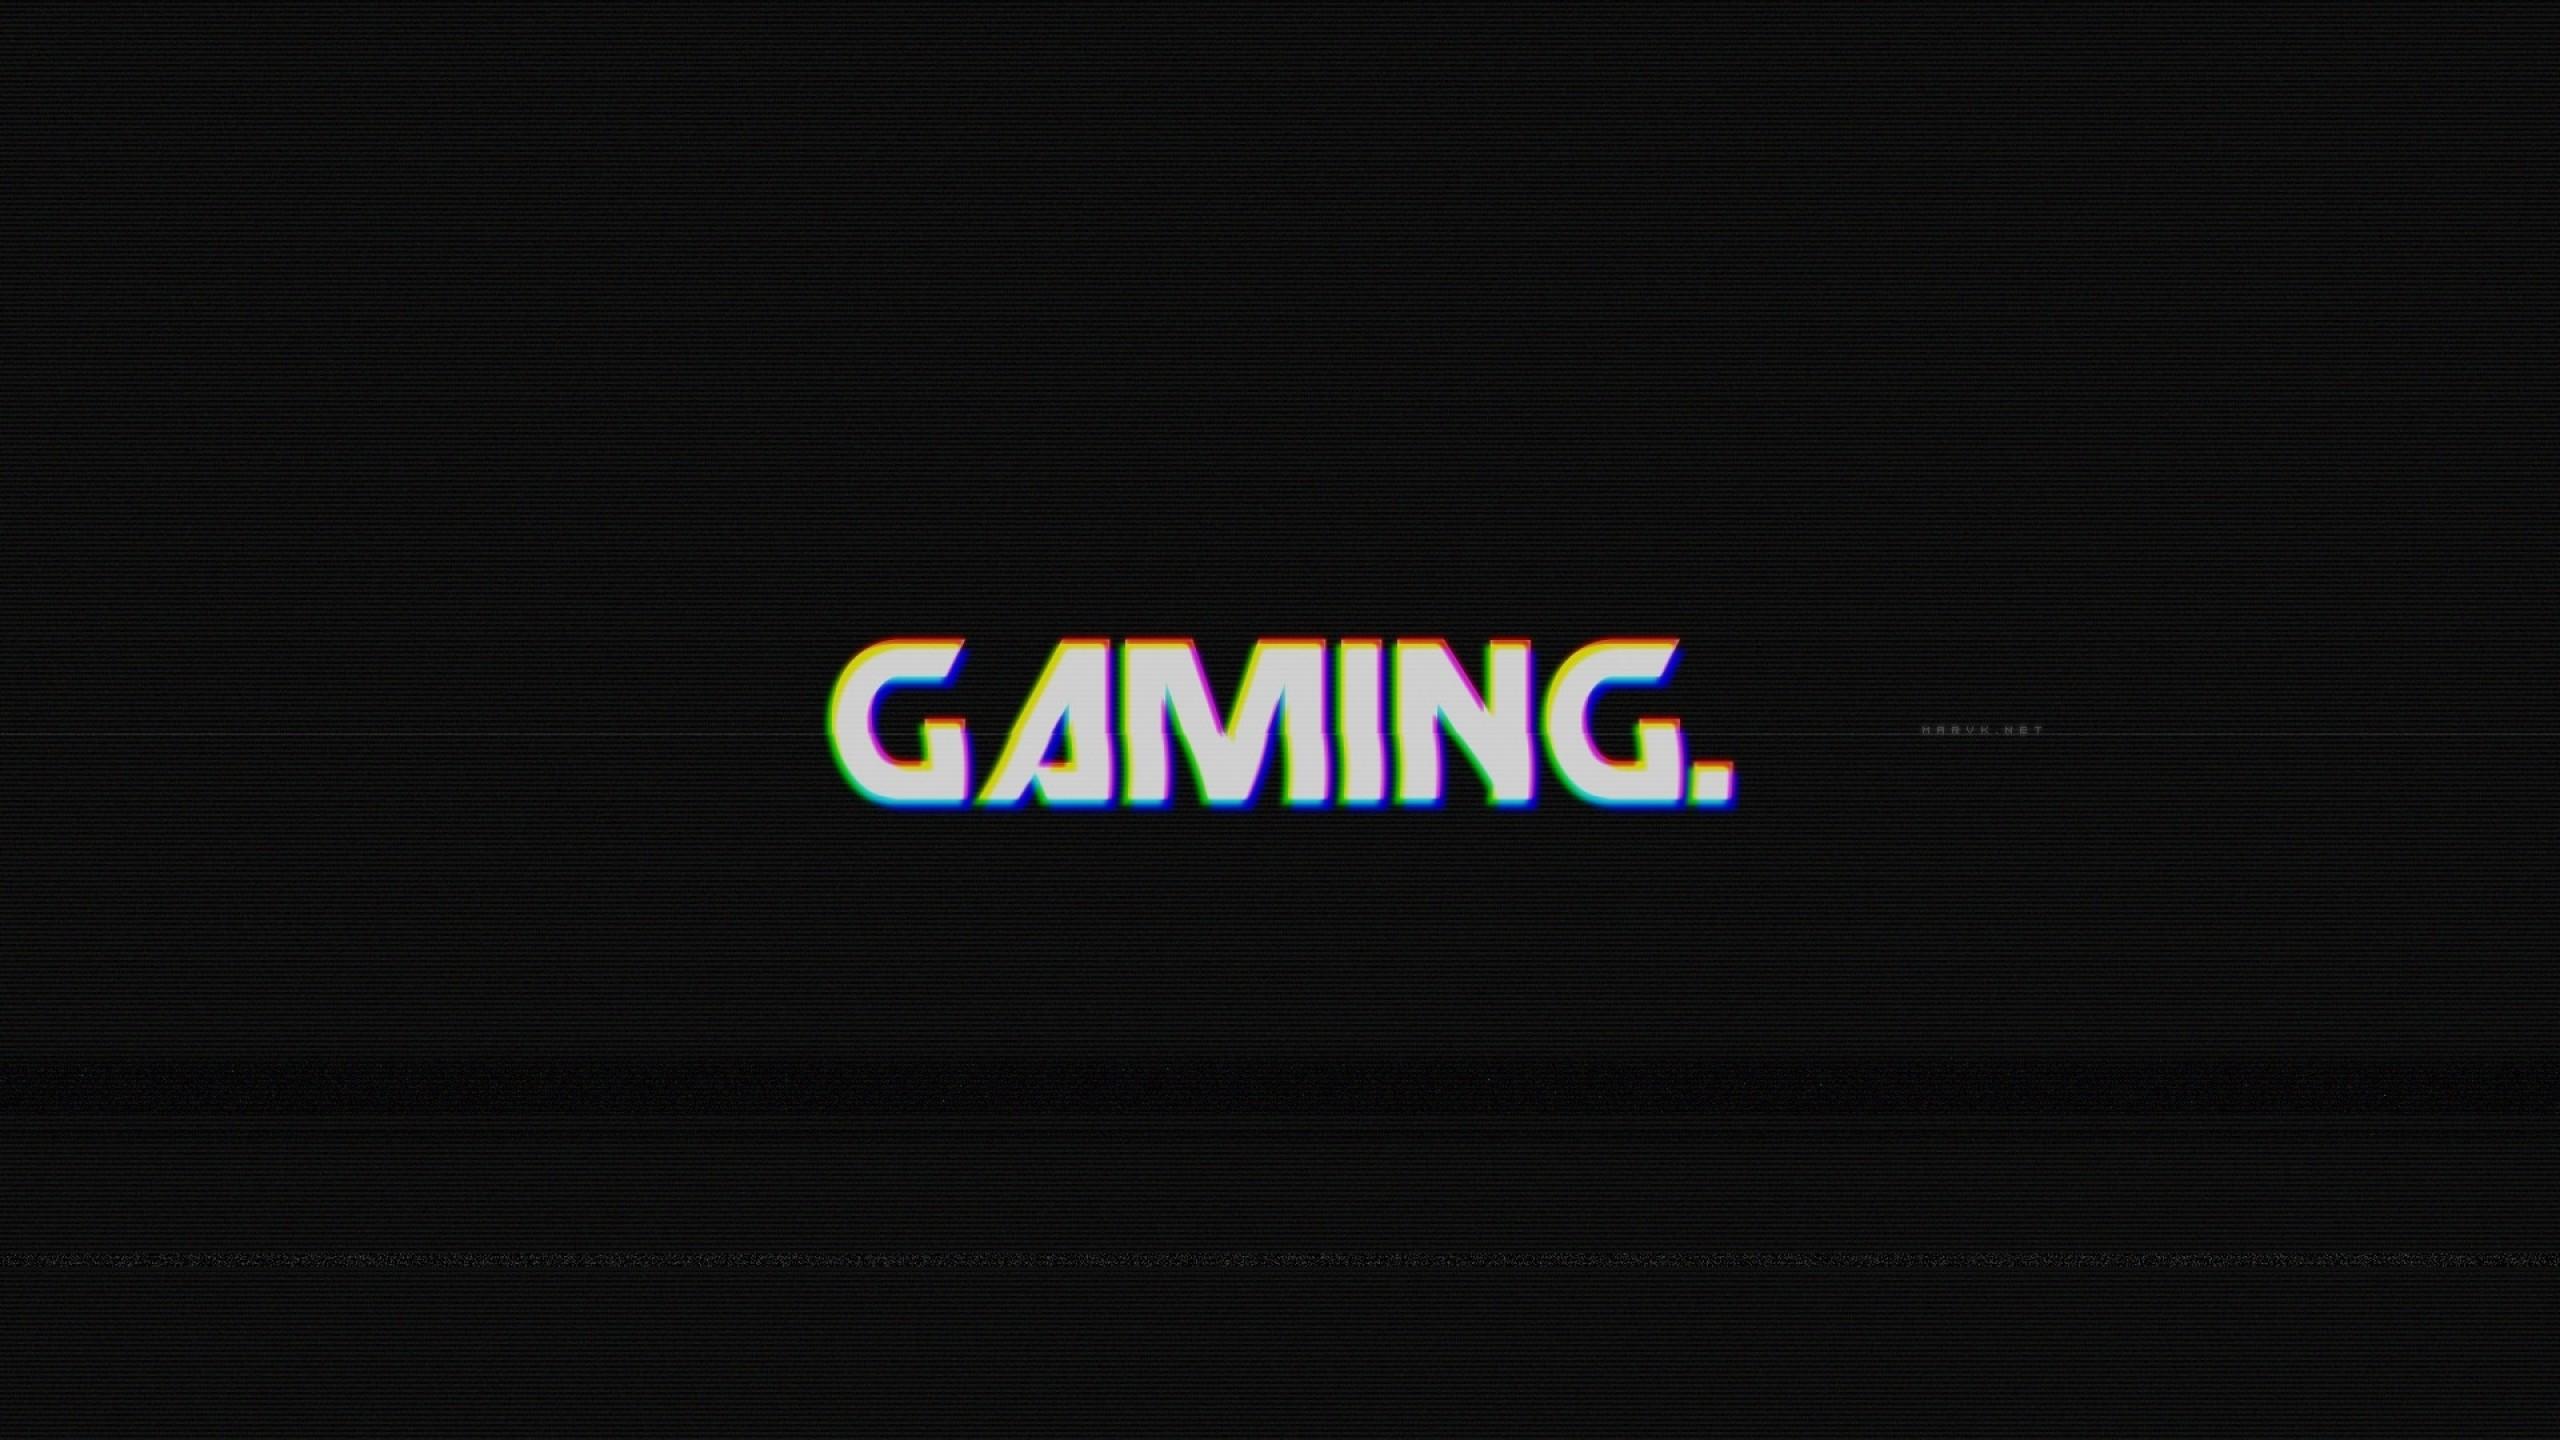 HQ Gaming Wallpapers | File 552.45Kb